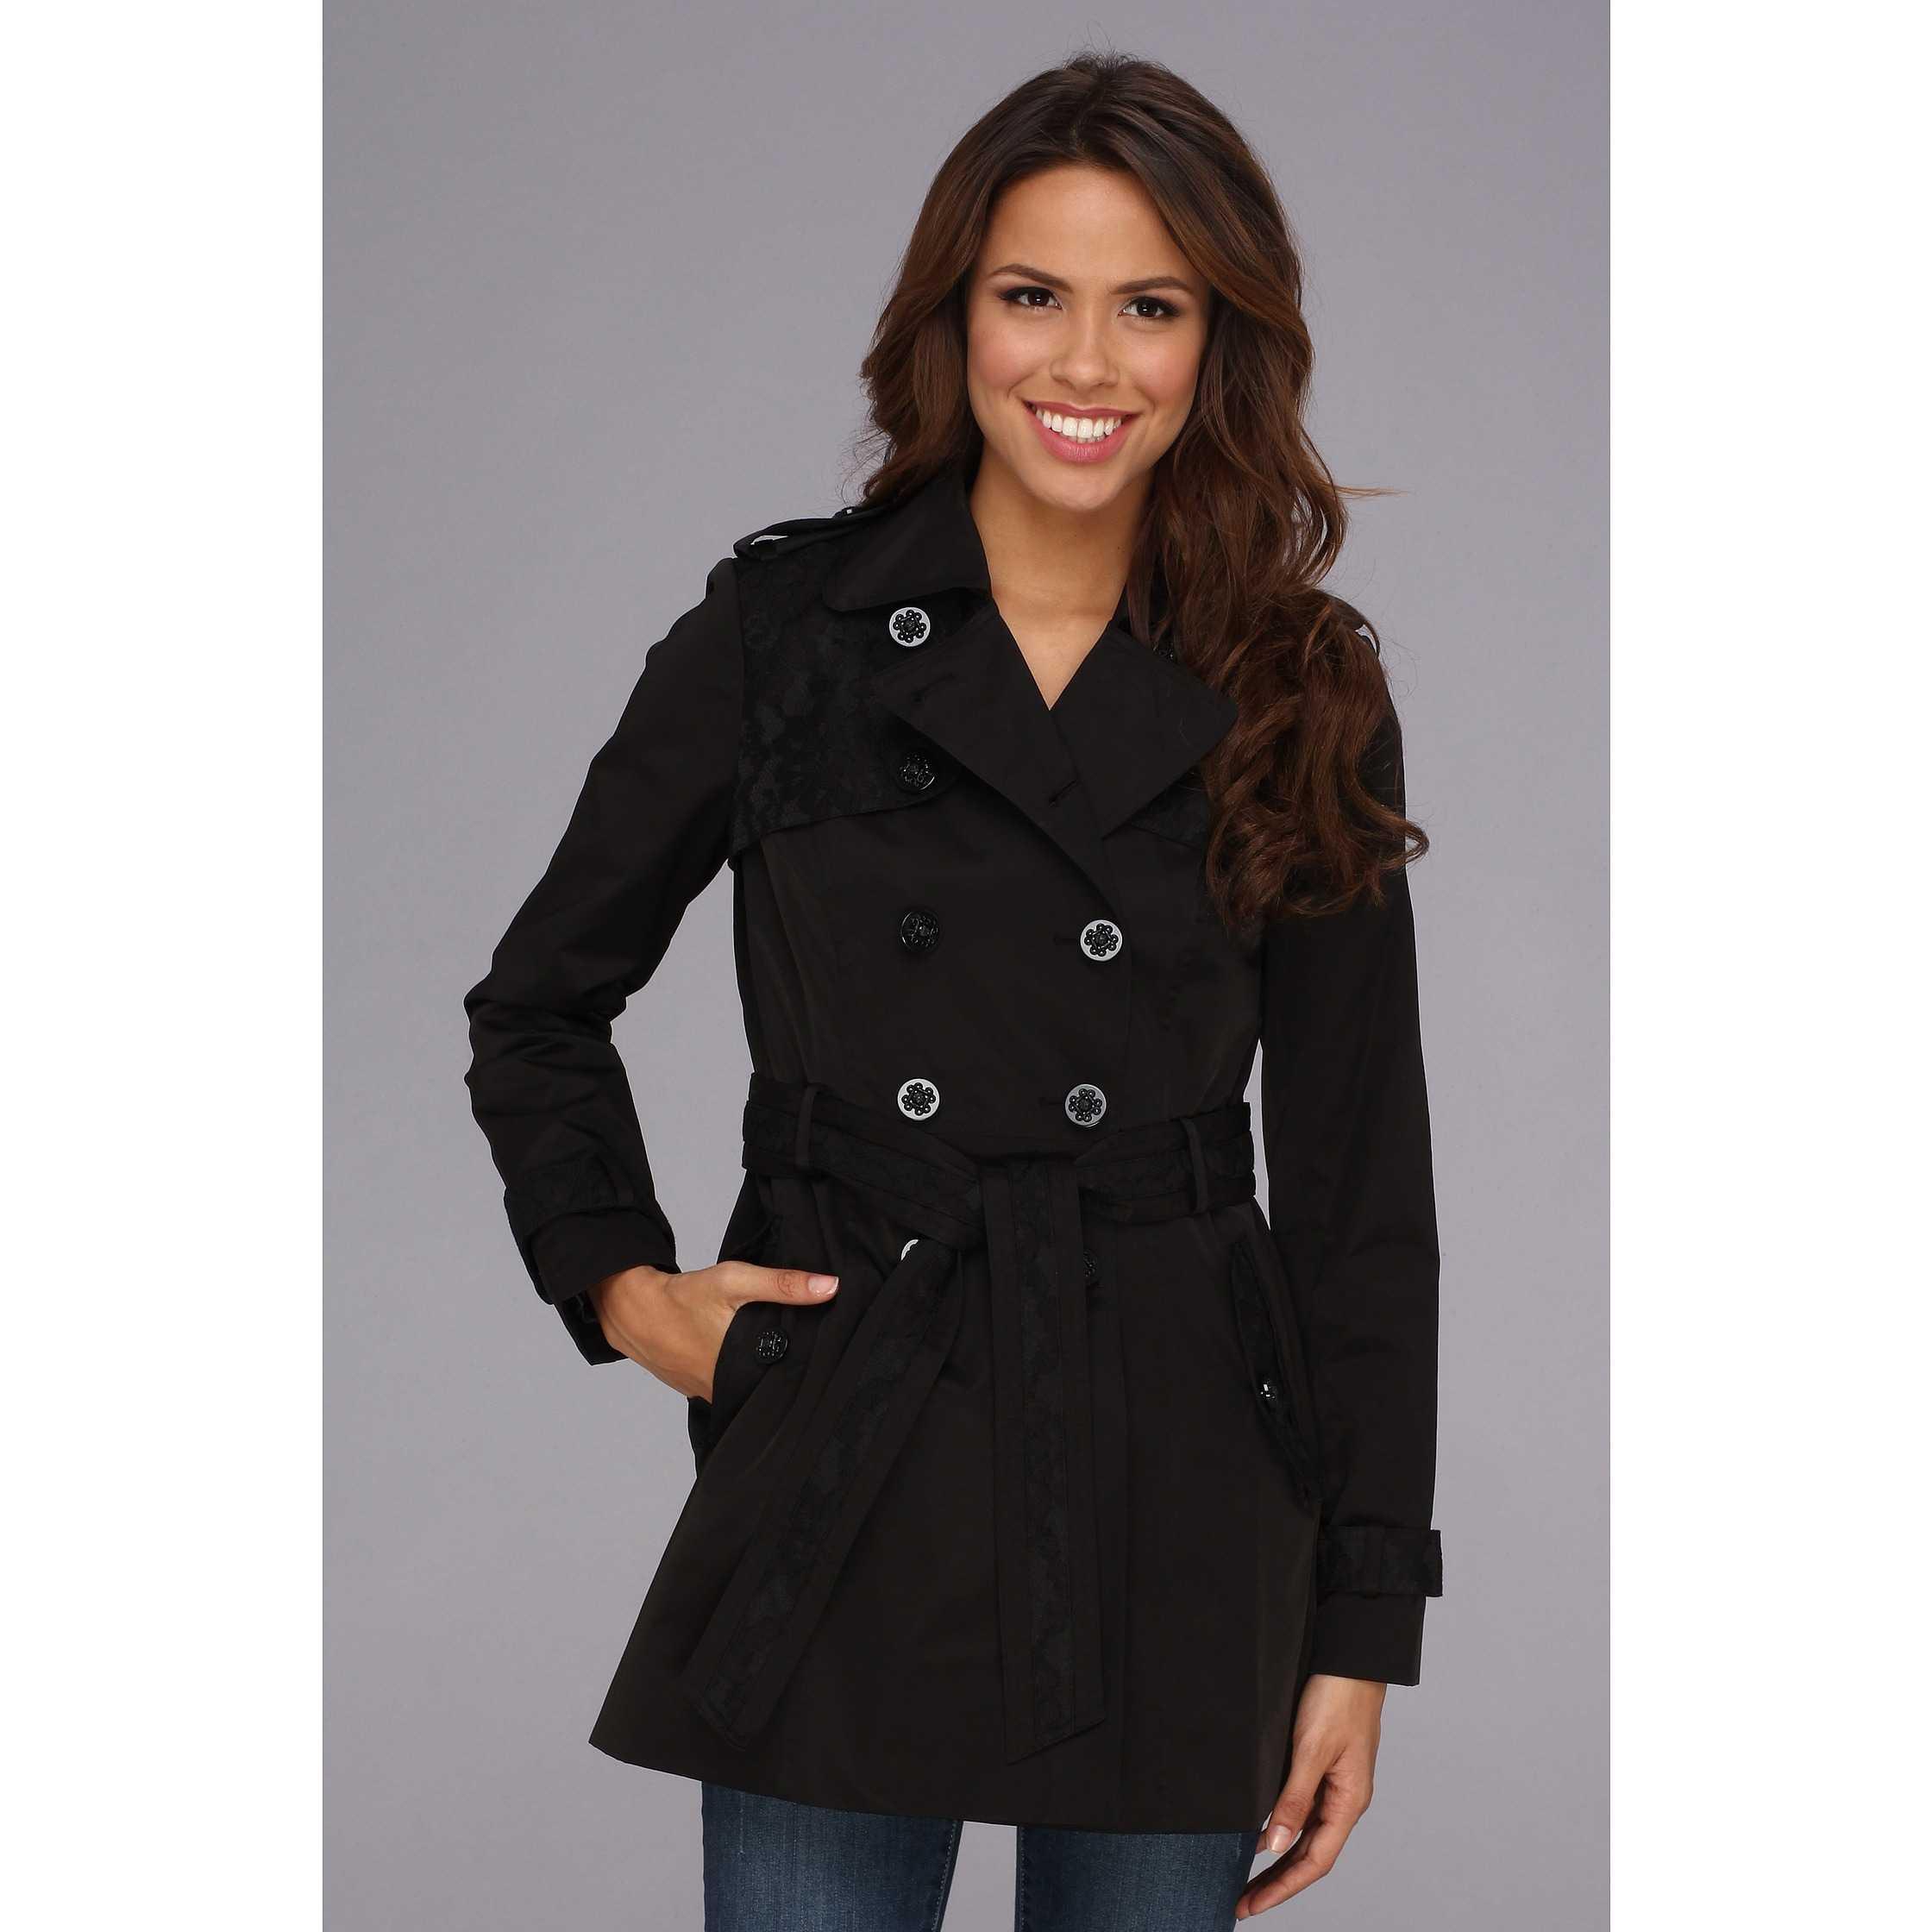 Jessica Simpson Lace Trim Trench Coat JOFMC619 Black trench dama